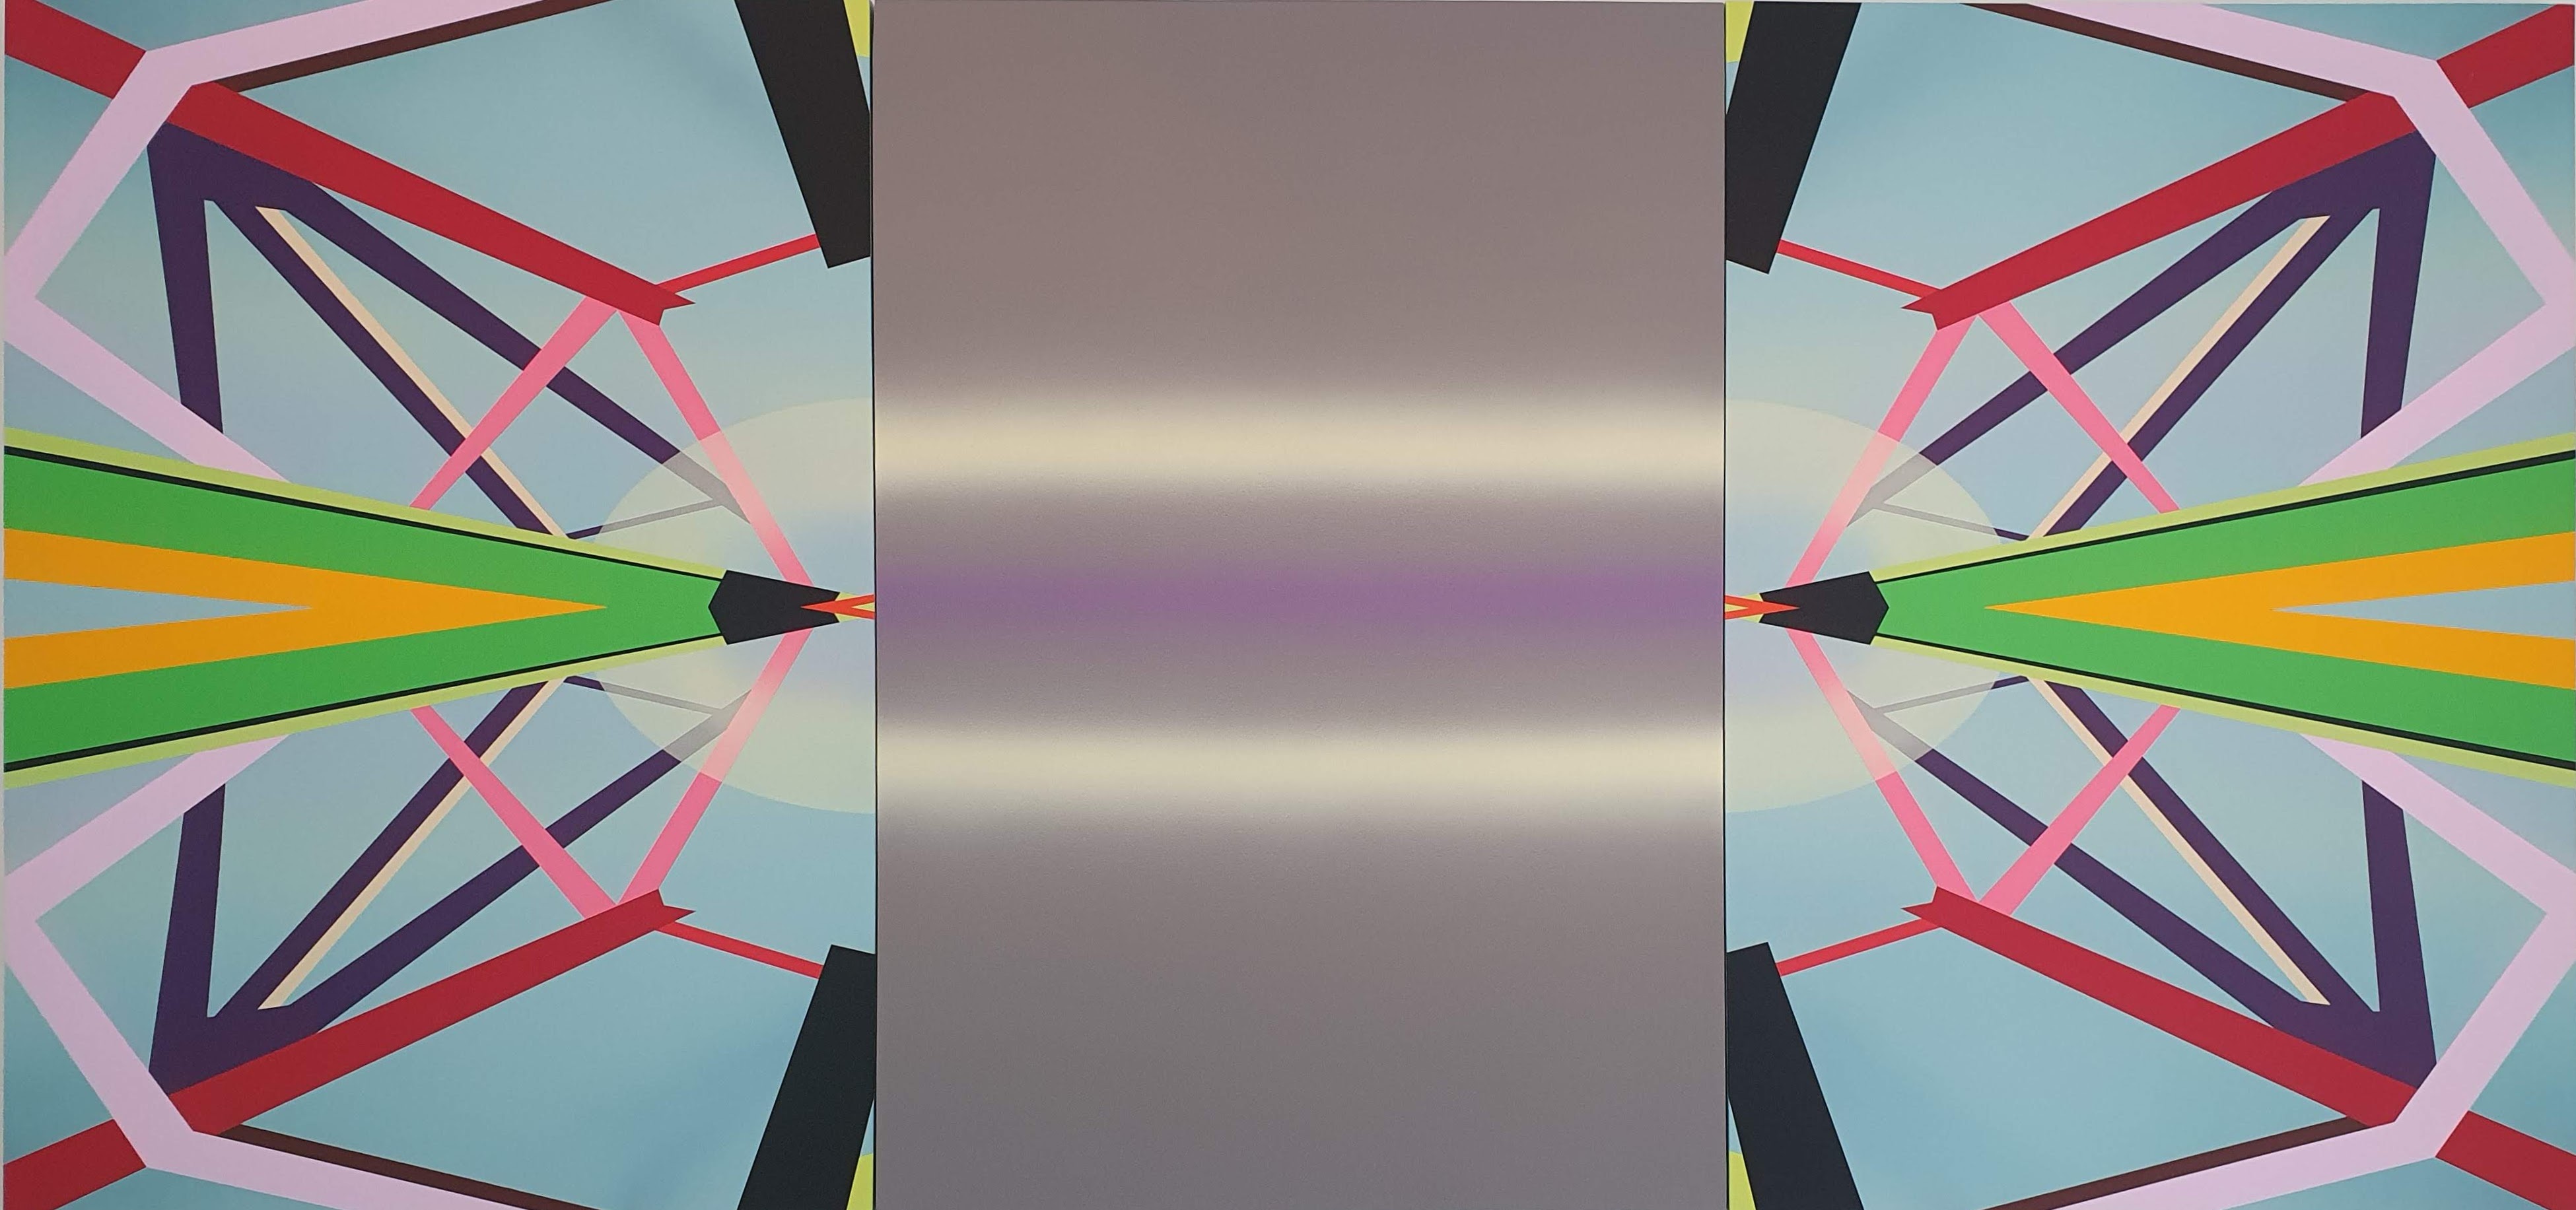 Bérénice Mayaux, Untitled triptych 2019, acrylic on wood 100 x 210 cm